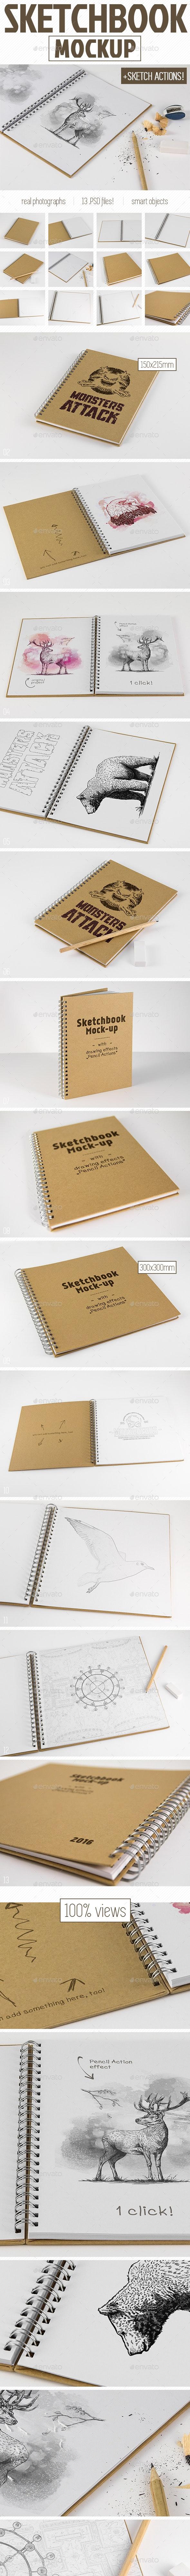 Sketchbook Mockup & Sketch Actions - Miscellaneous Print